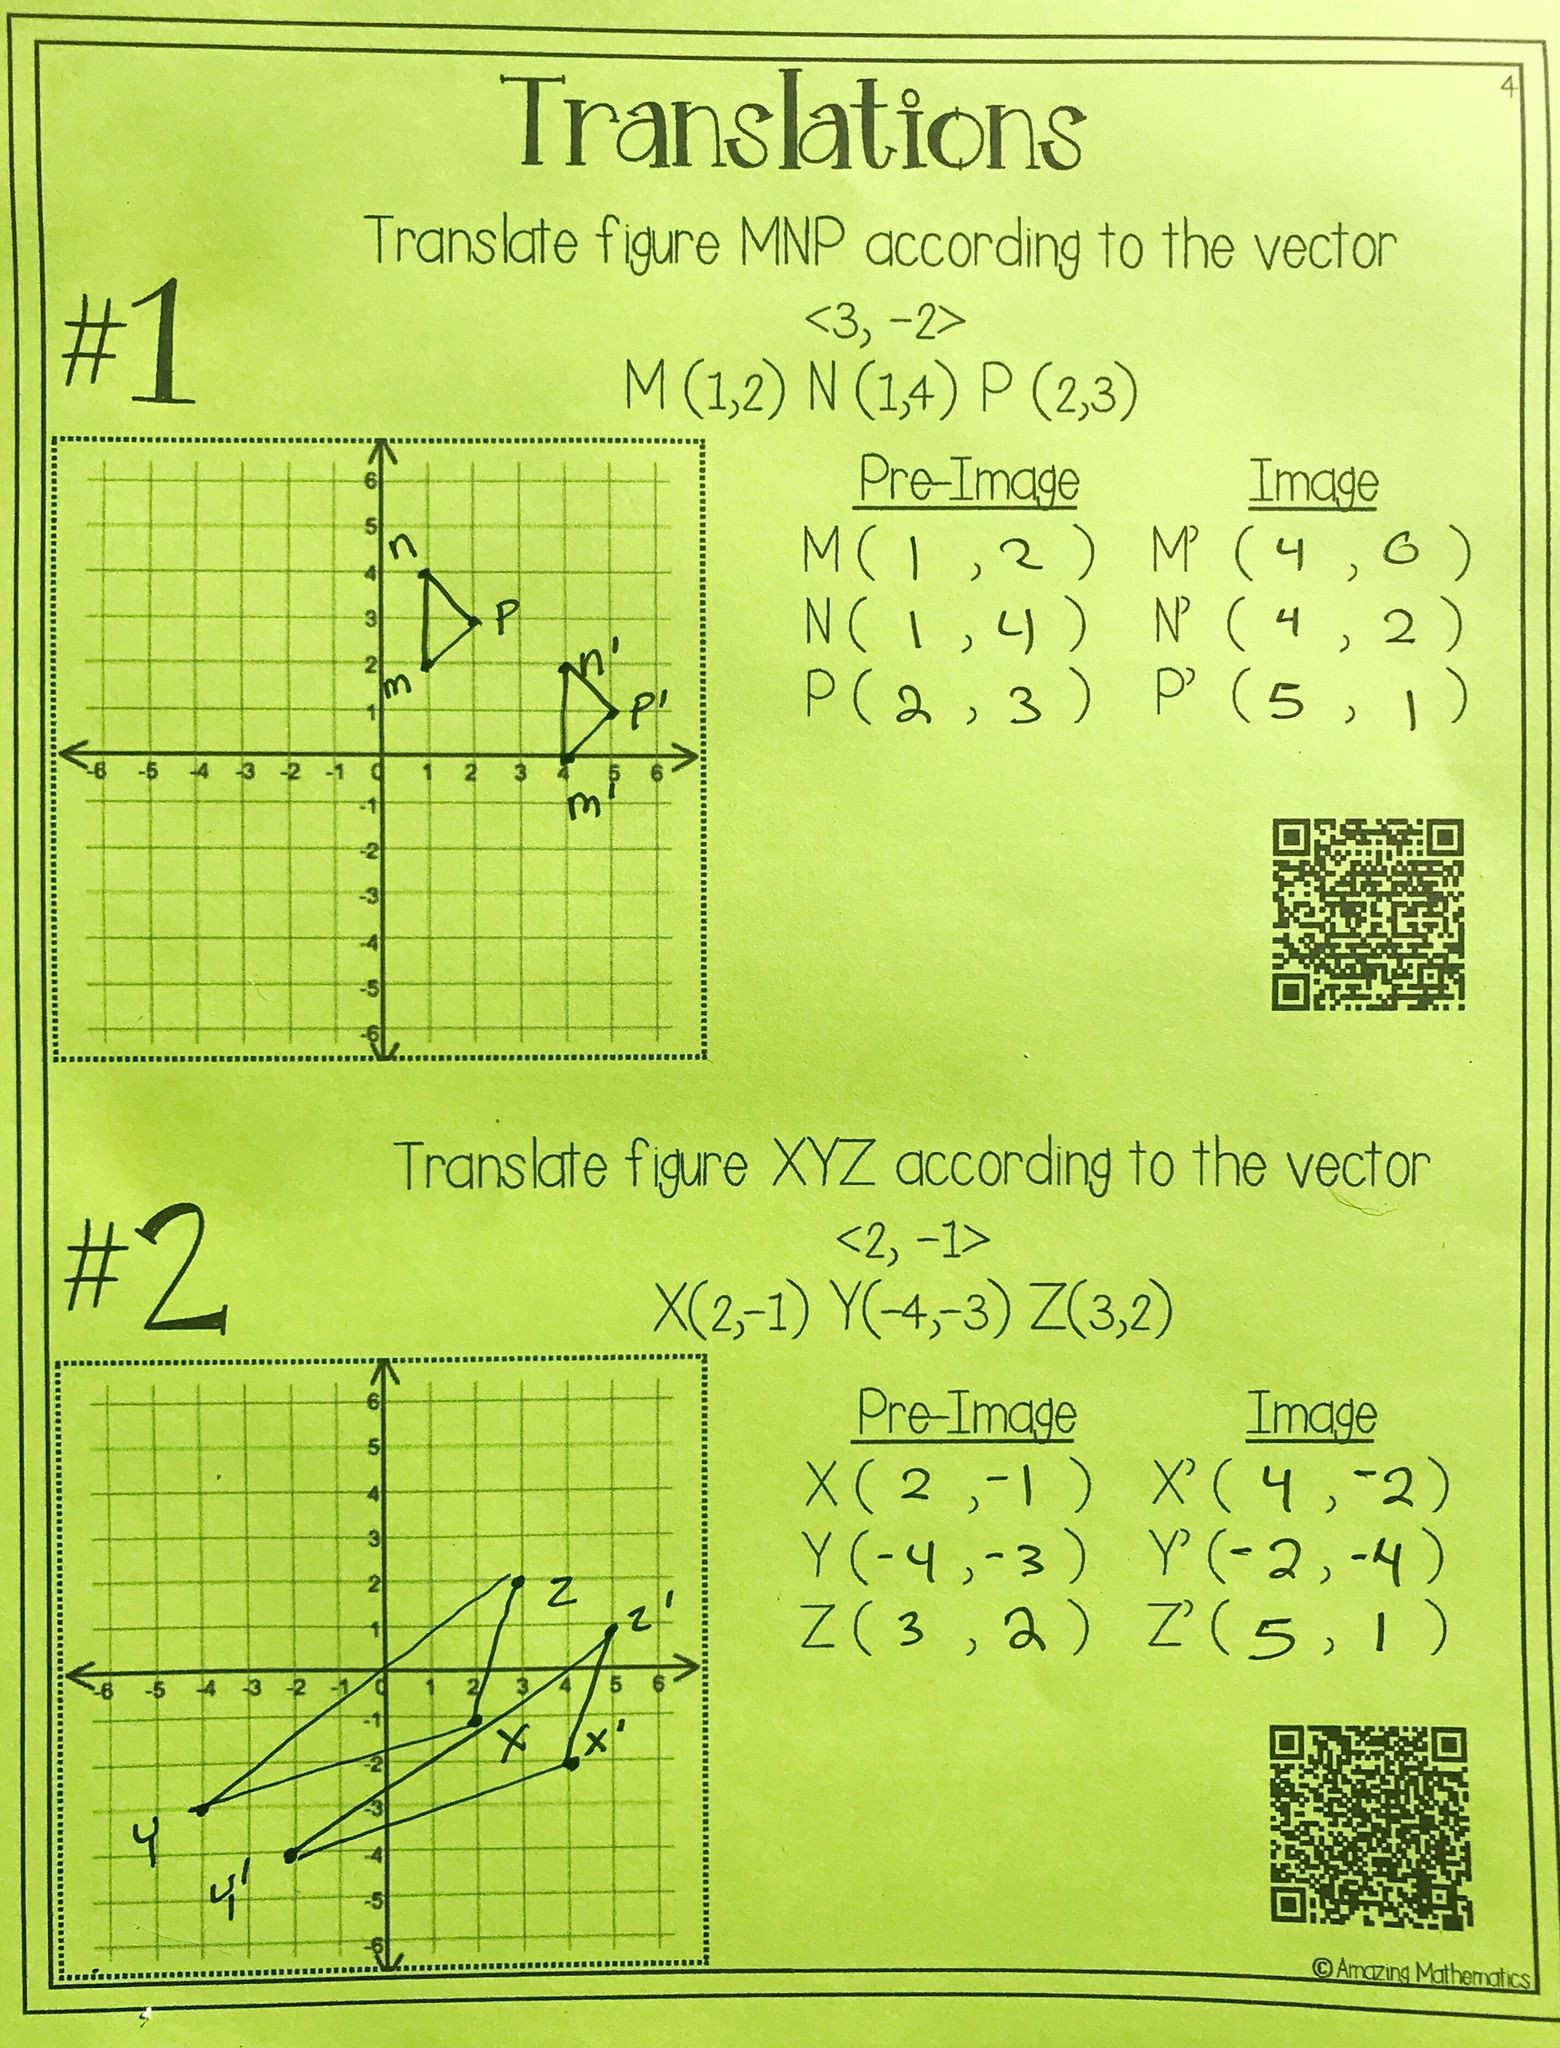 Geometry Transformations Worksheet Pdf Hs Geometry Transformations Workbook Translations